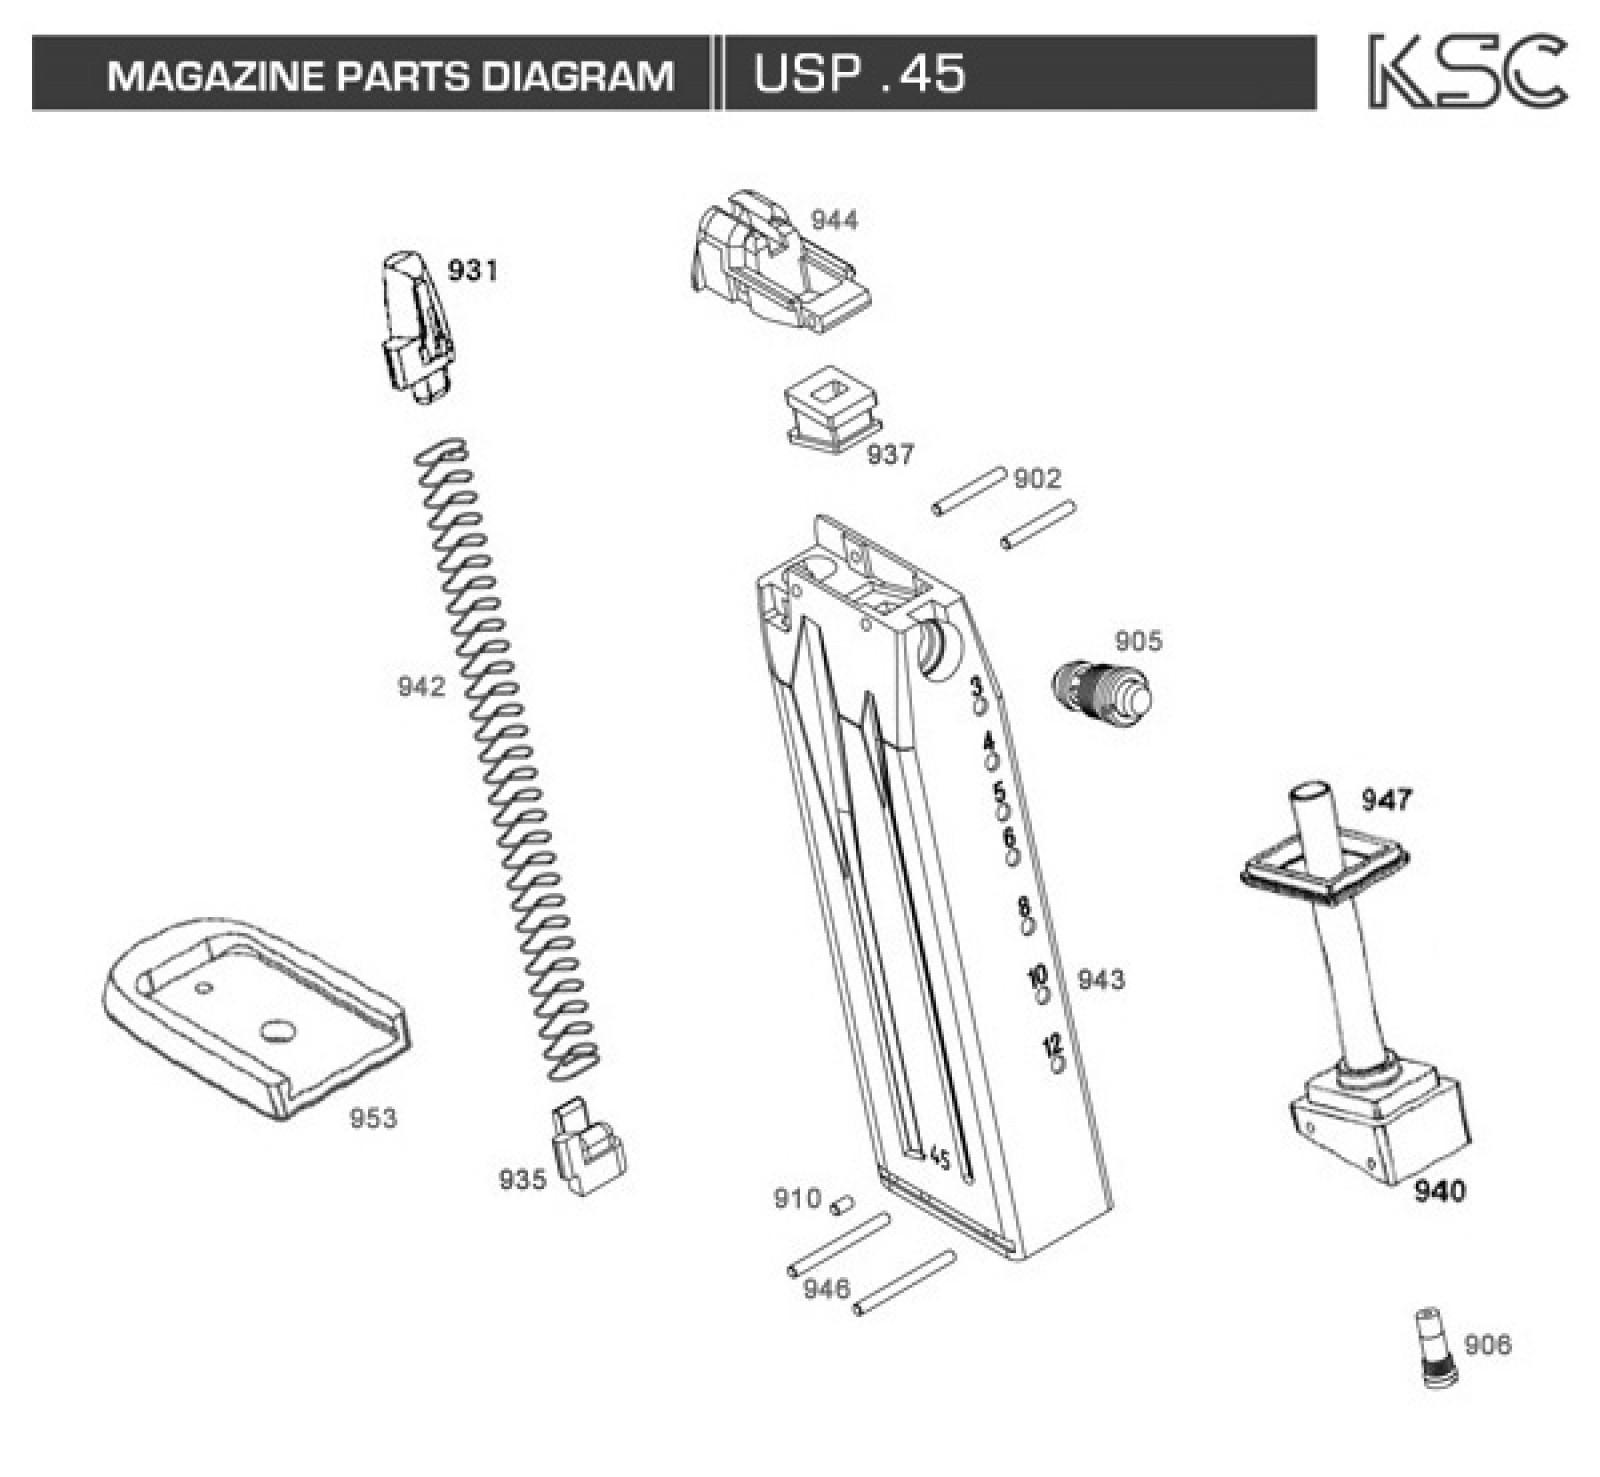 makarov parts diagram